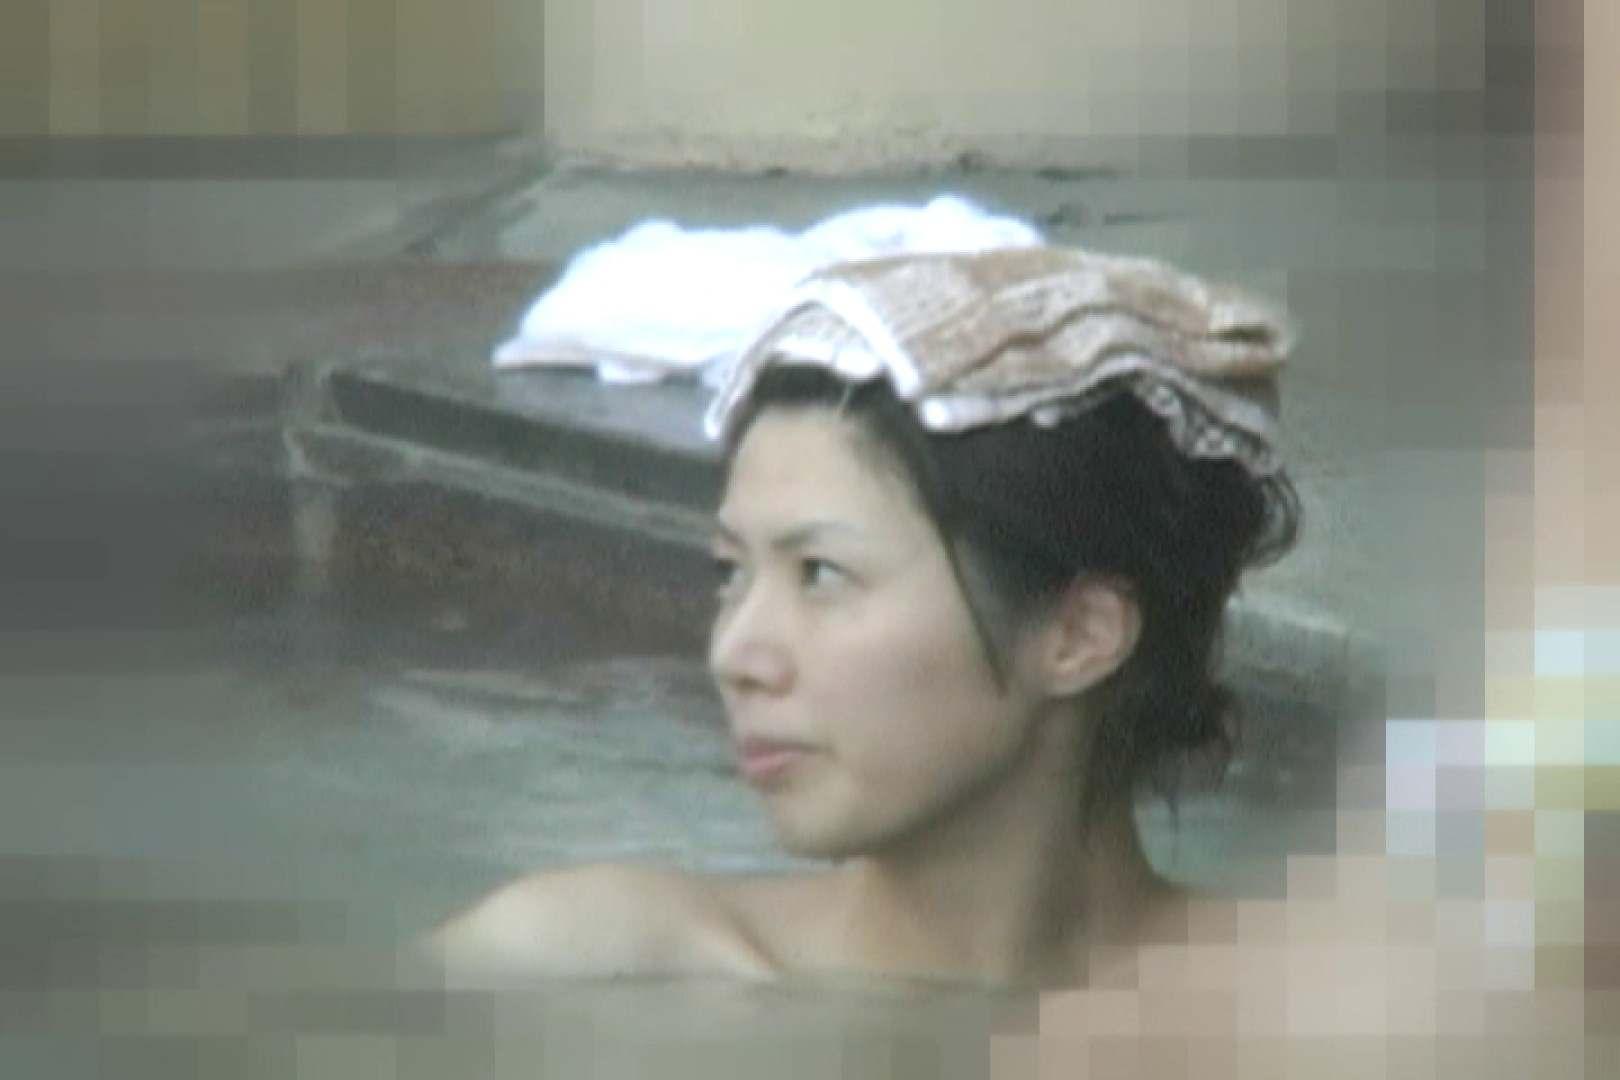 Aquaな露天風呂Vol.856 0  41連発 30